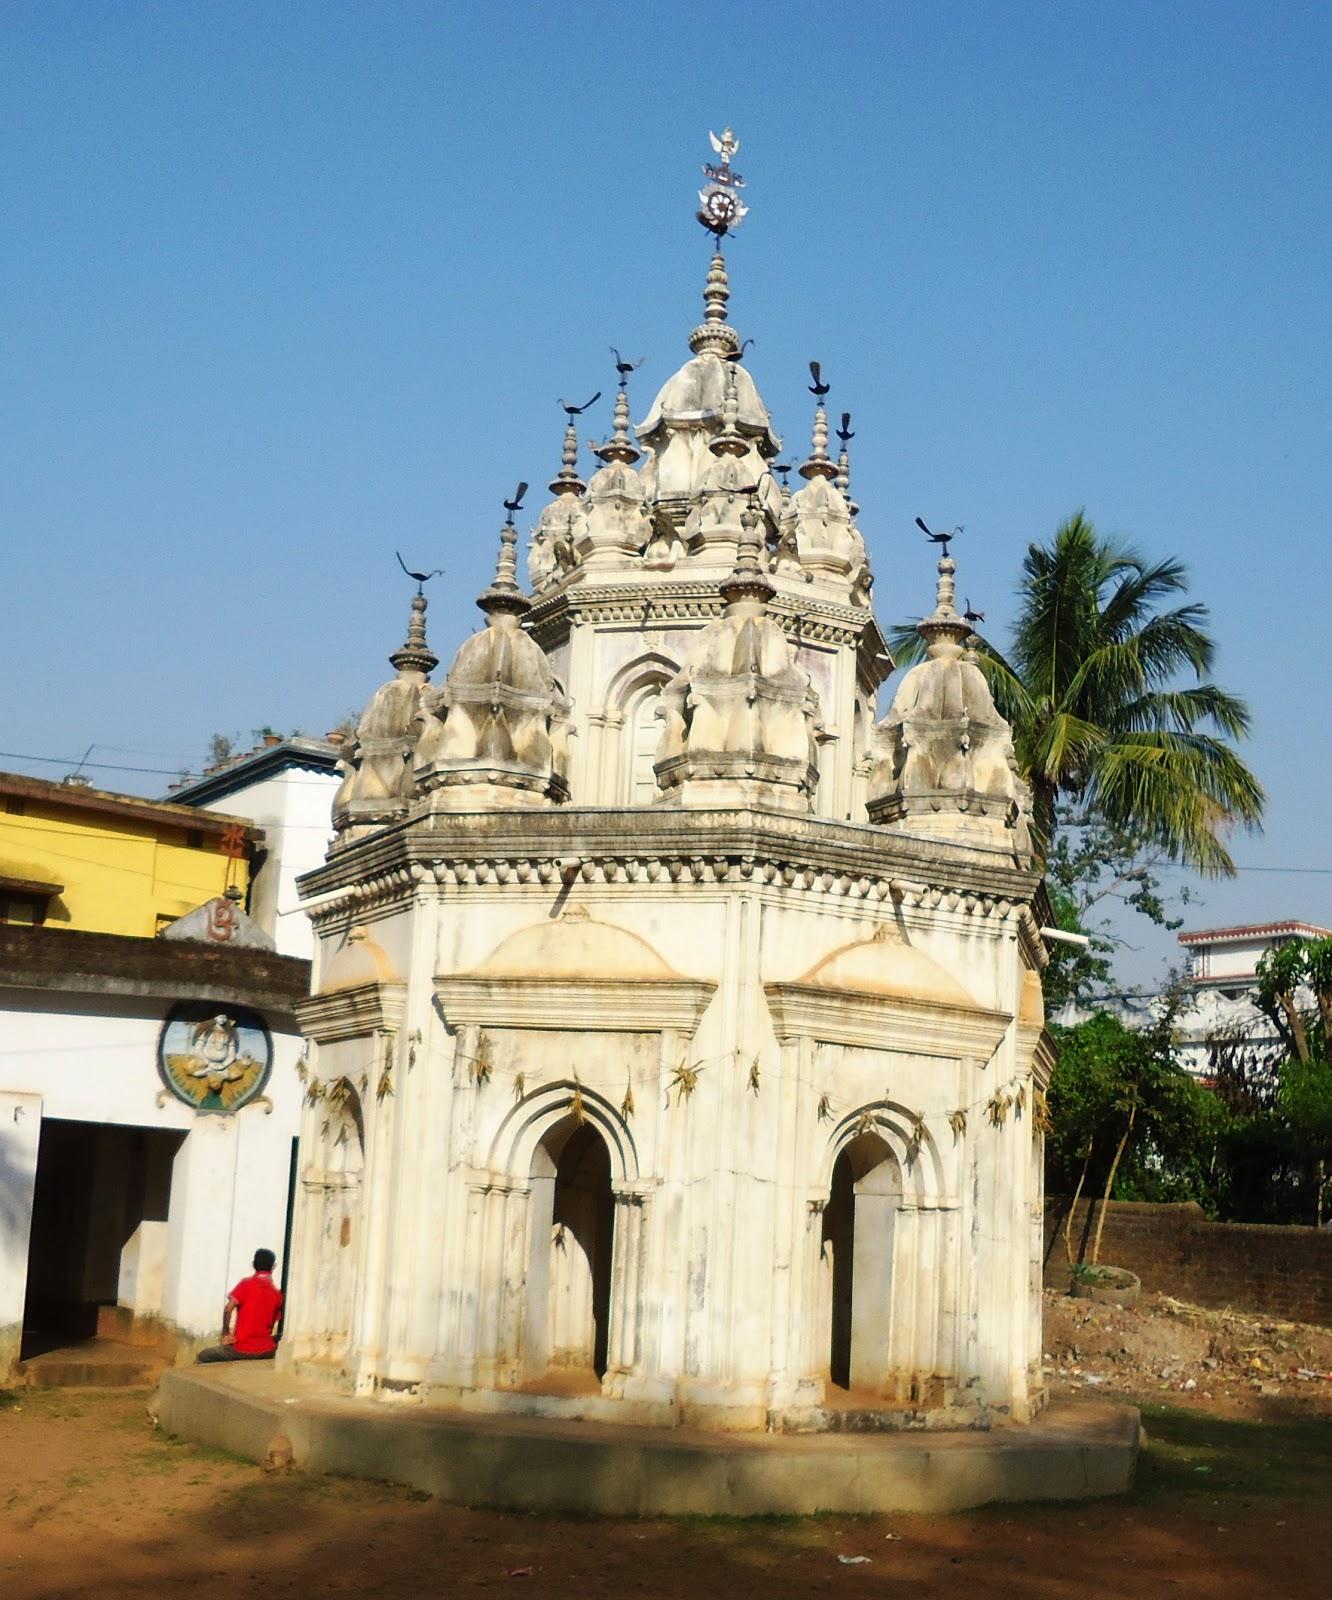 Unknown Places To Visit In Kolkata: Weekend Getaway / Destination From Kolkata In